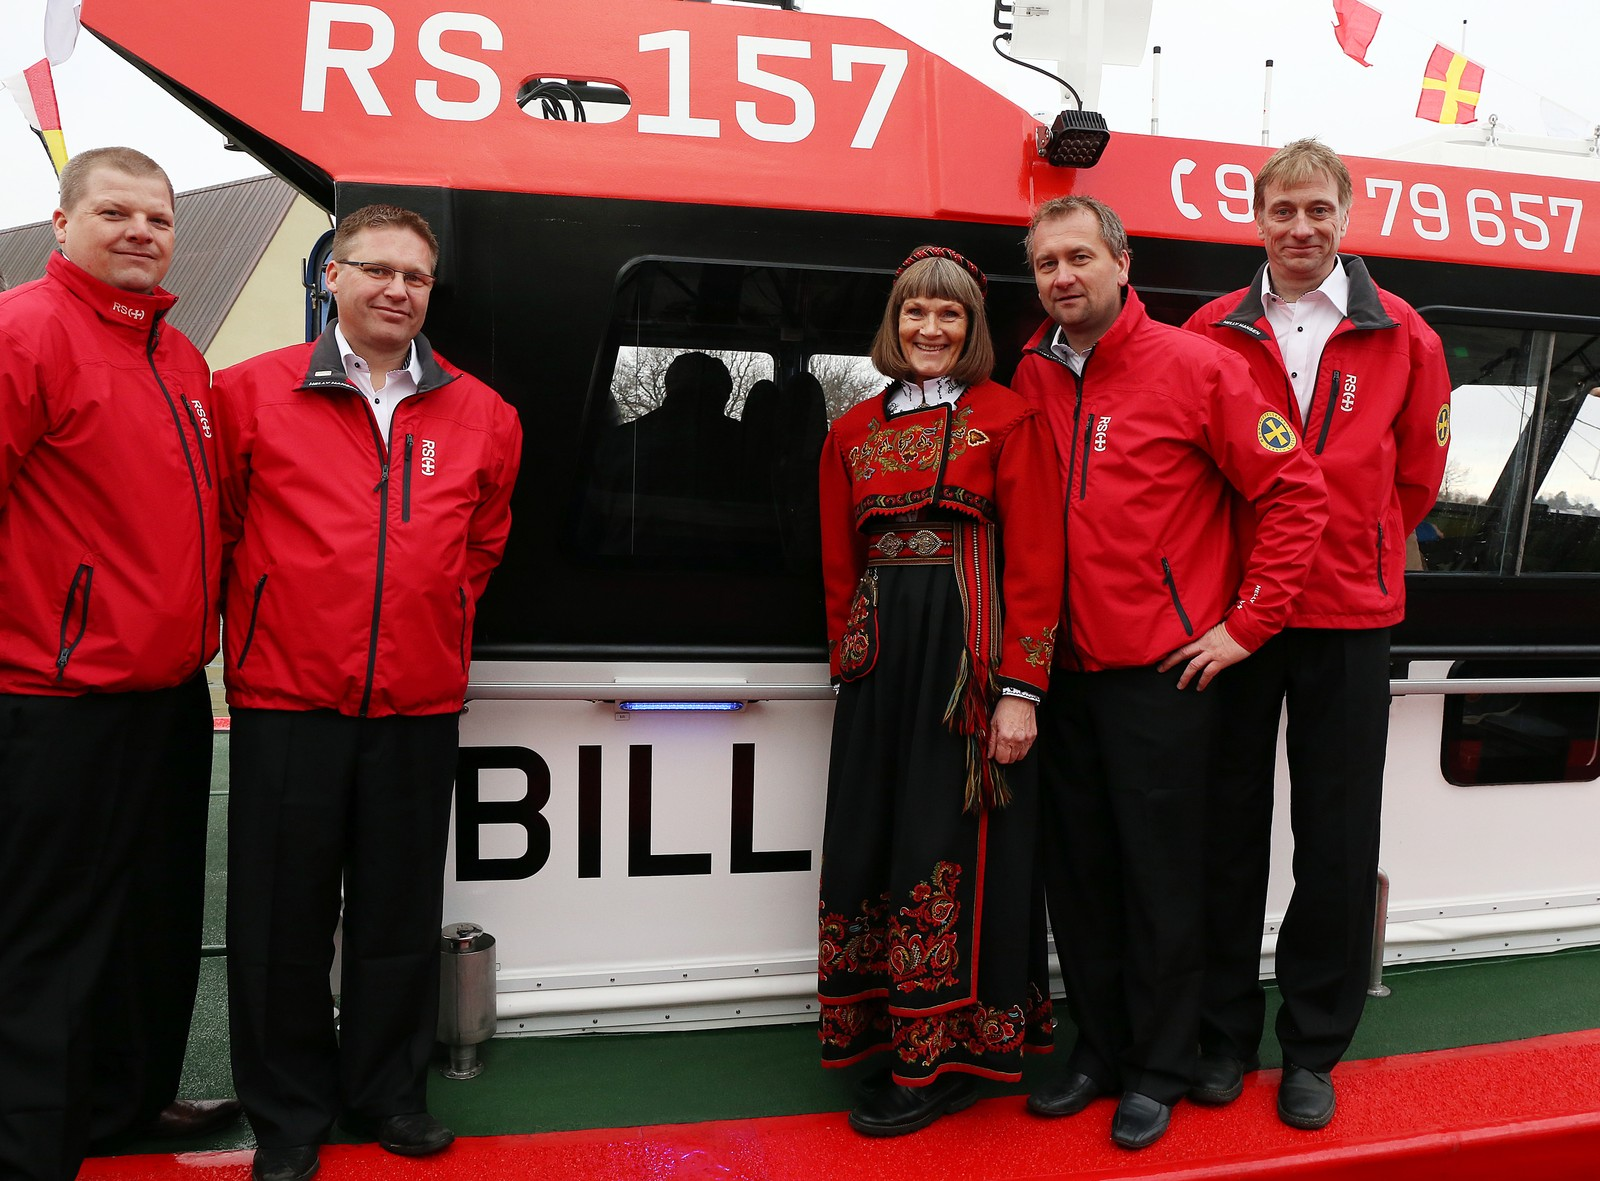 Mannskapet på RS Bill sammen med gudmor.